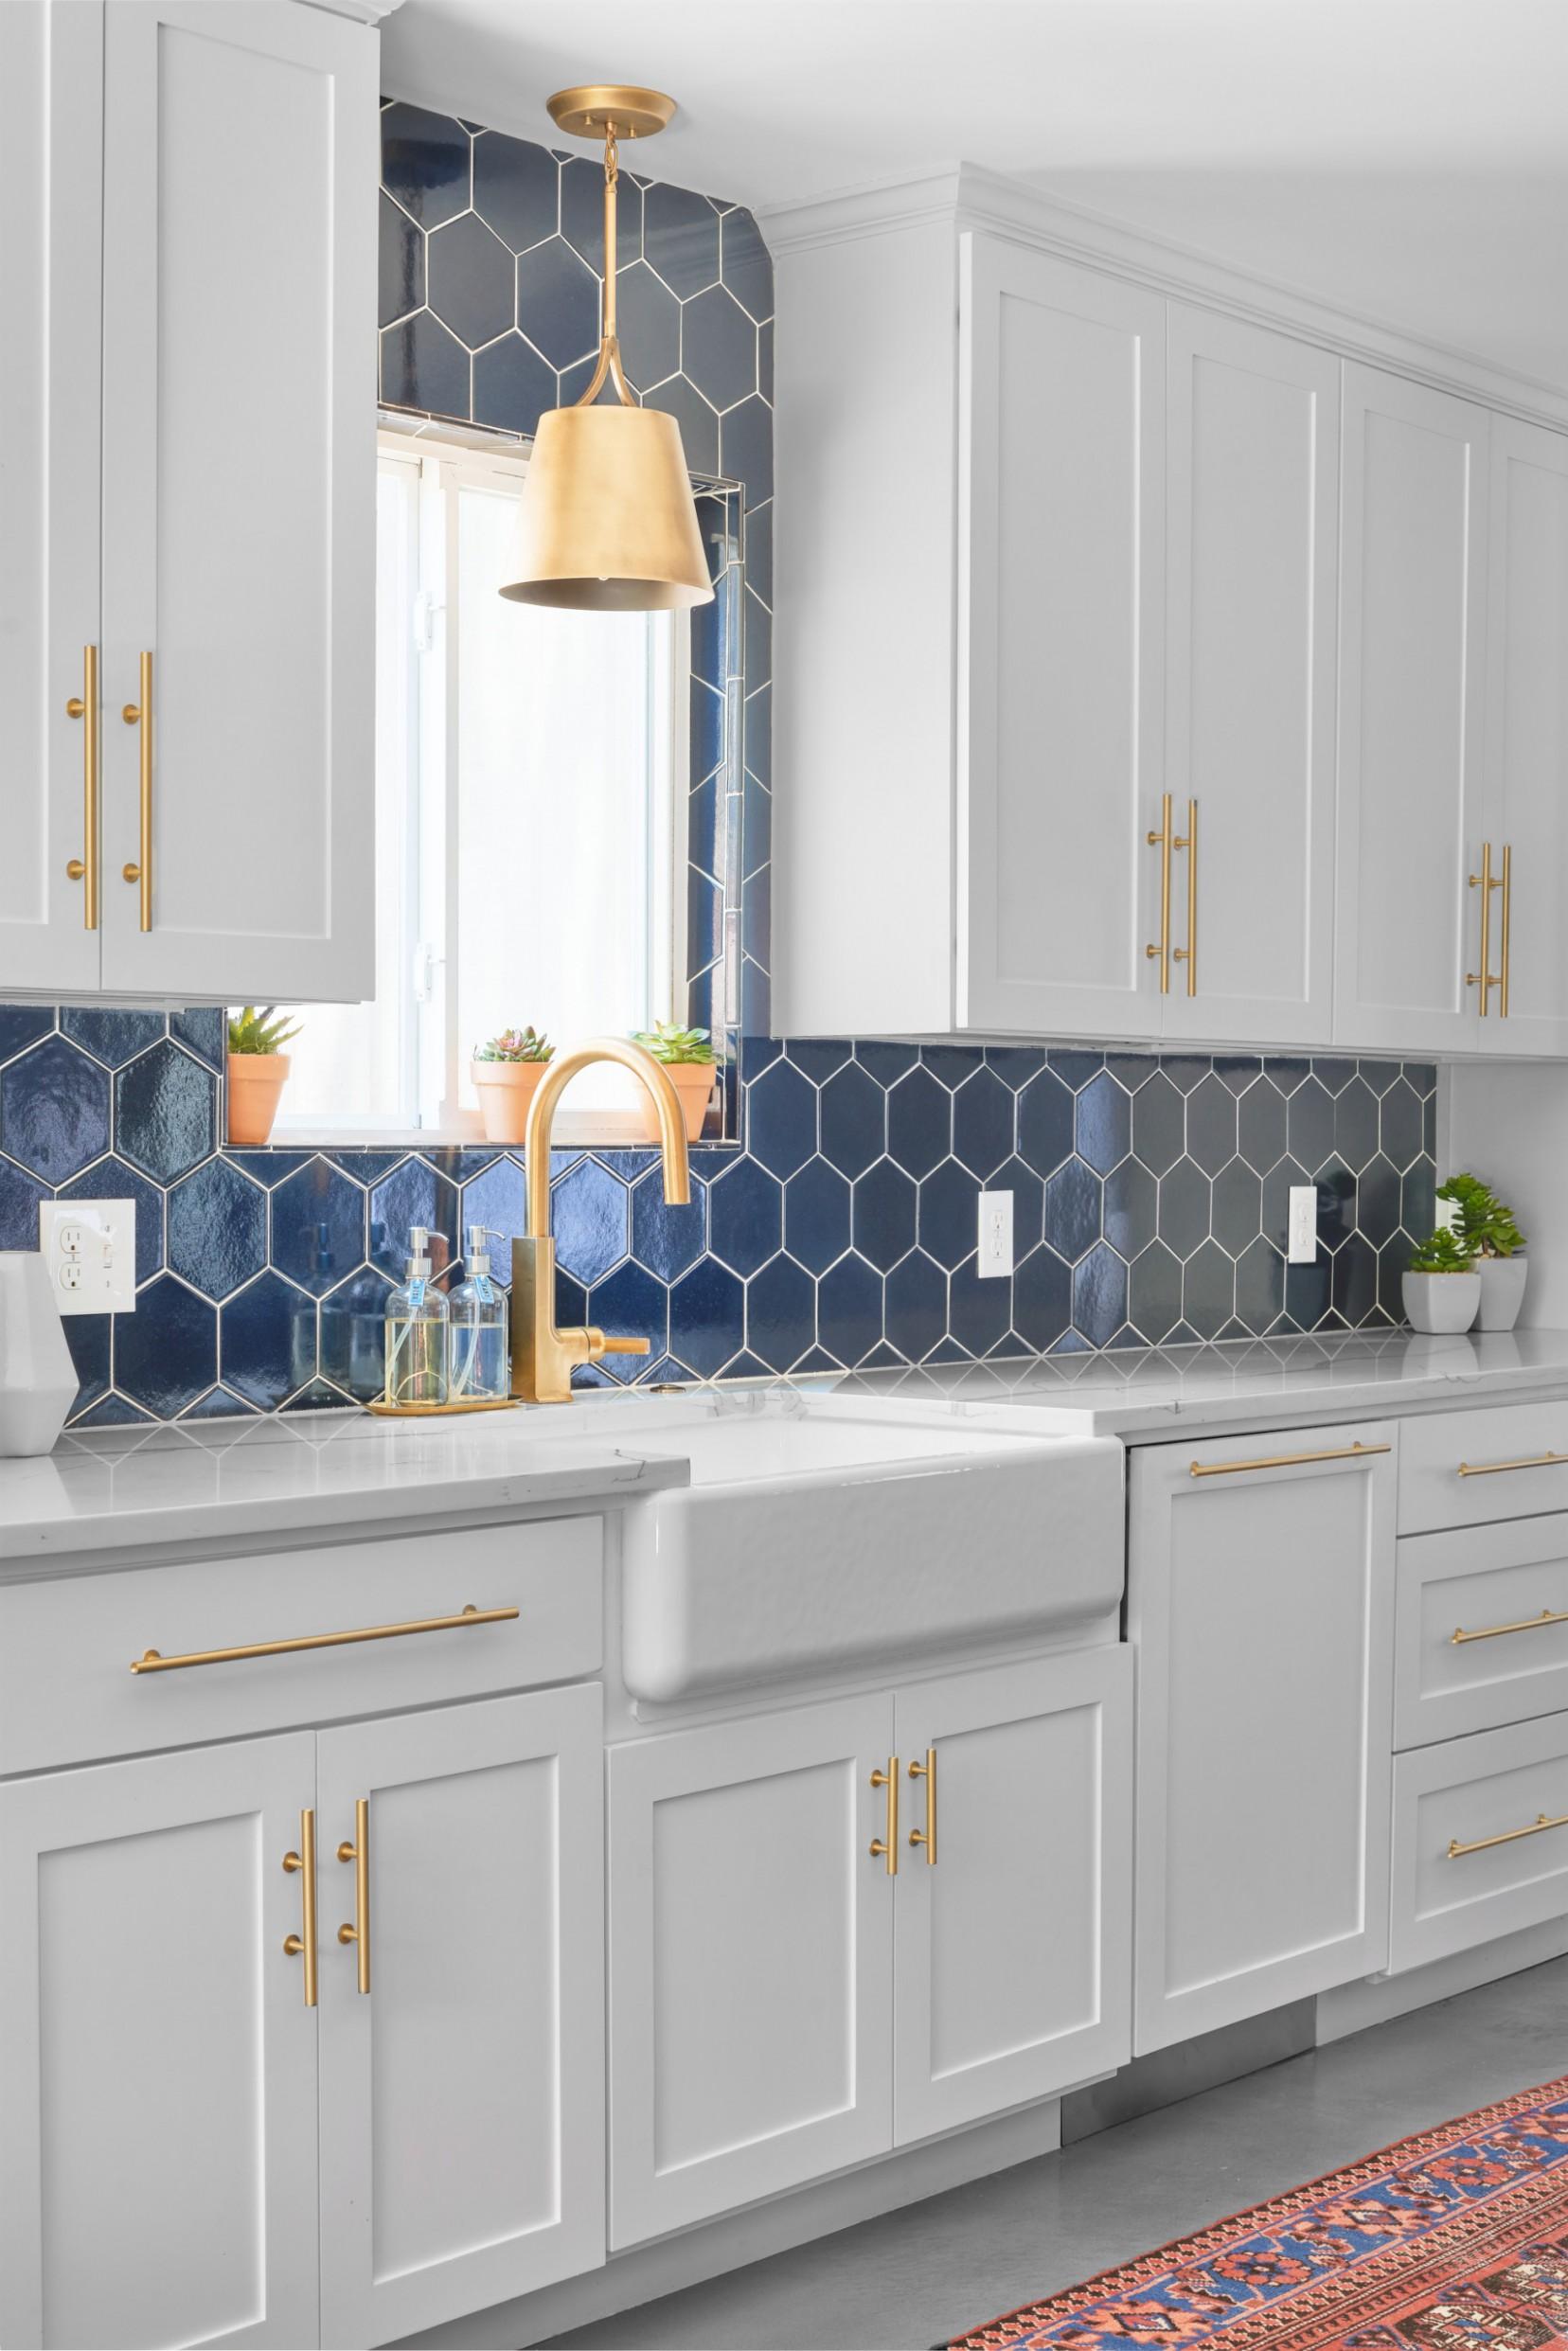 11 Beautiful Kitchen With Blue Backsplash Pictures & Ideas  - Gray Kitchen Cabinets With Blue Backsplash